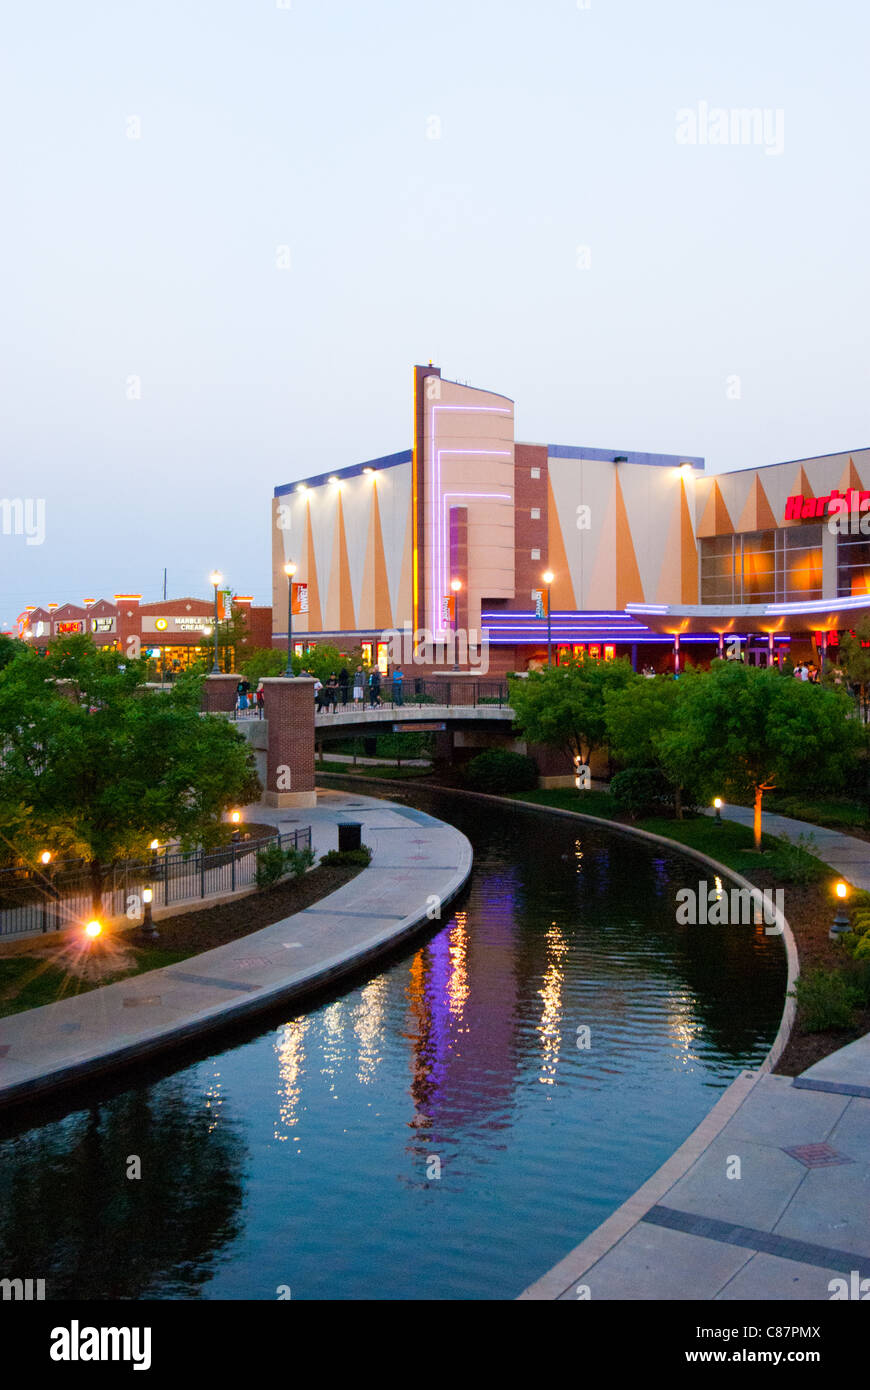 Bricktown Canal in the Bricktown entertainment district near downtown Oklahoma City, Oklahoma, USA - Stock Image